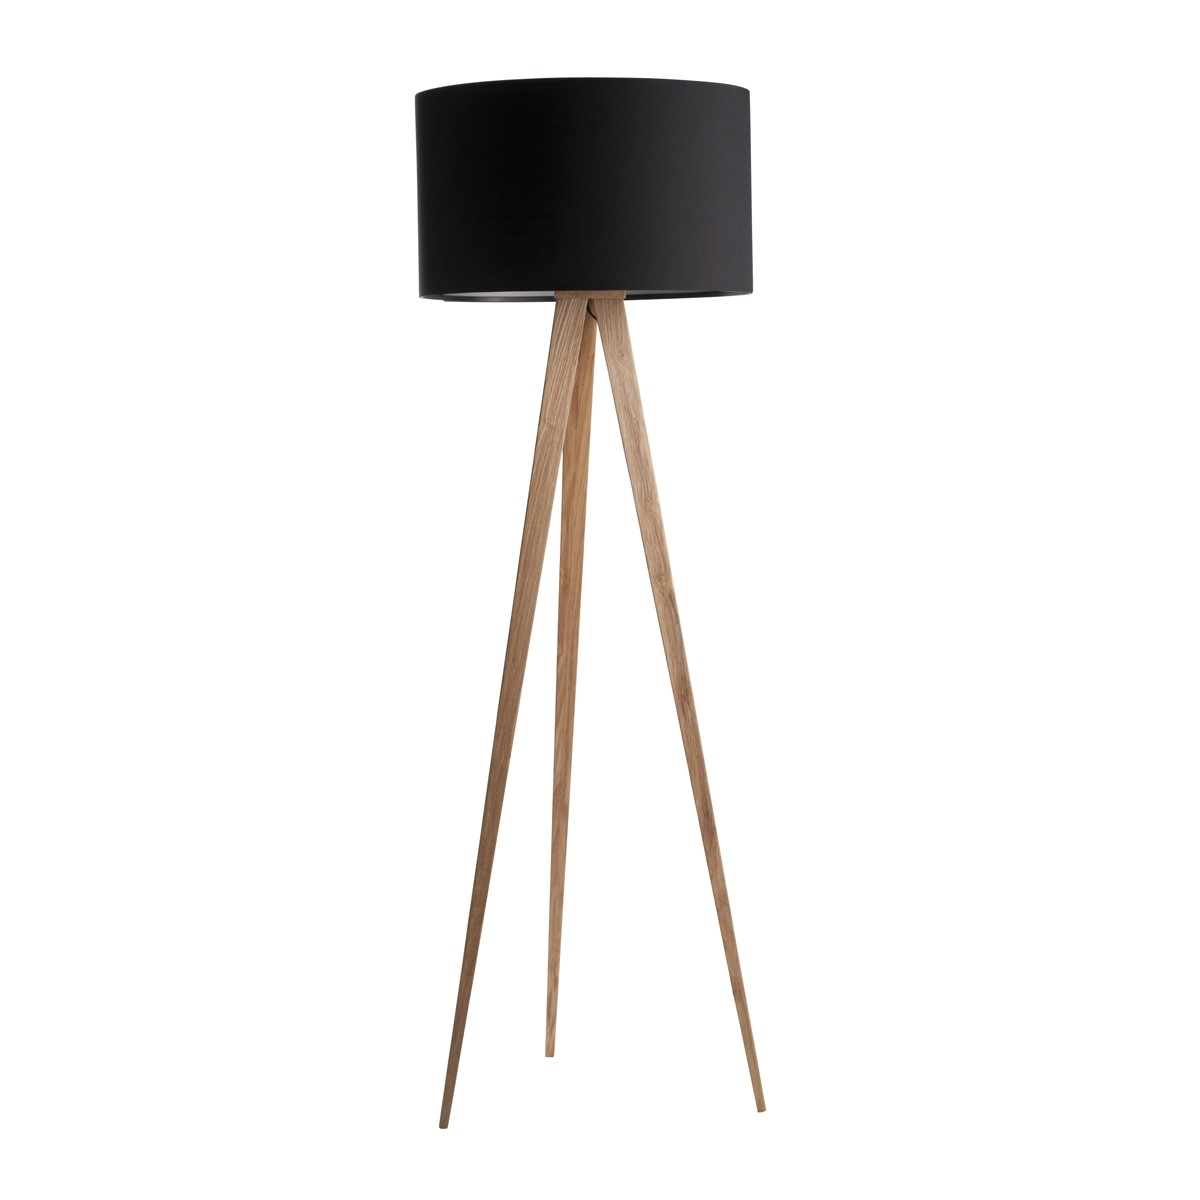 pr f r lampadaire trepied bois design njh93 slabtownrib. Black Bedroom Furniture Sets. Home Design Ideas